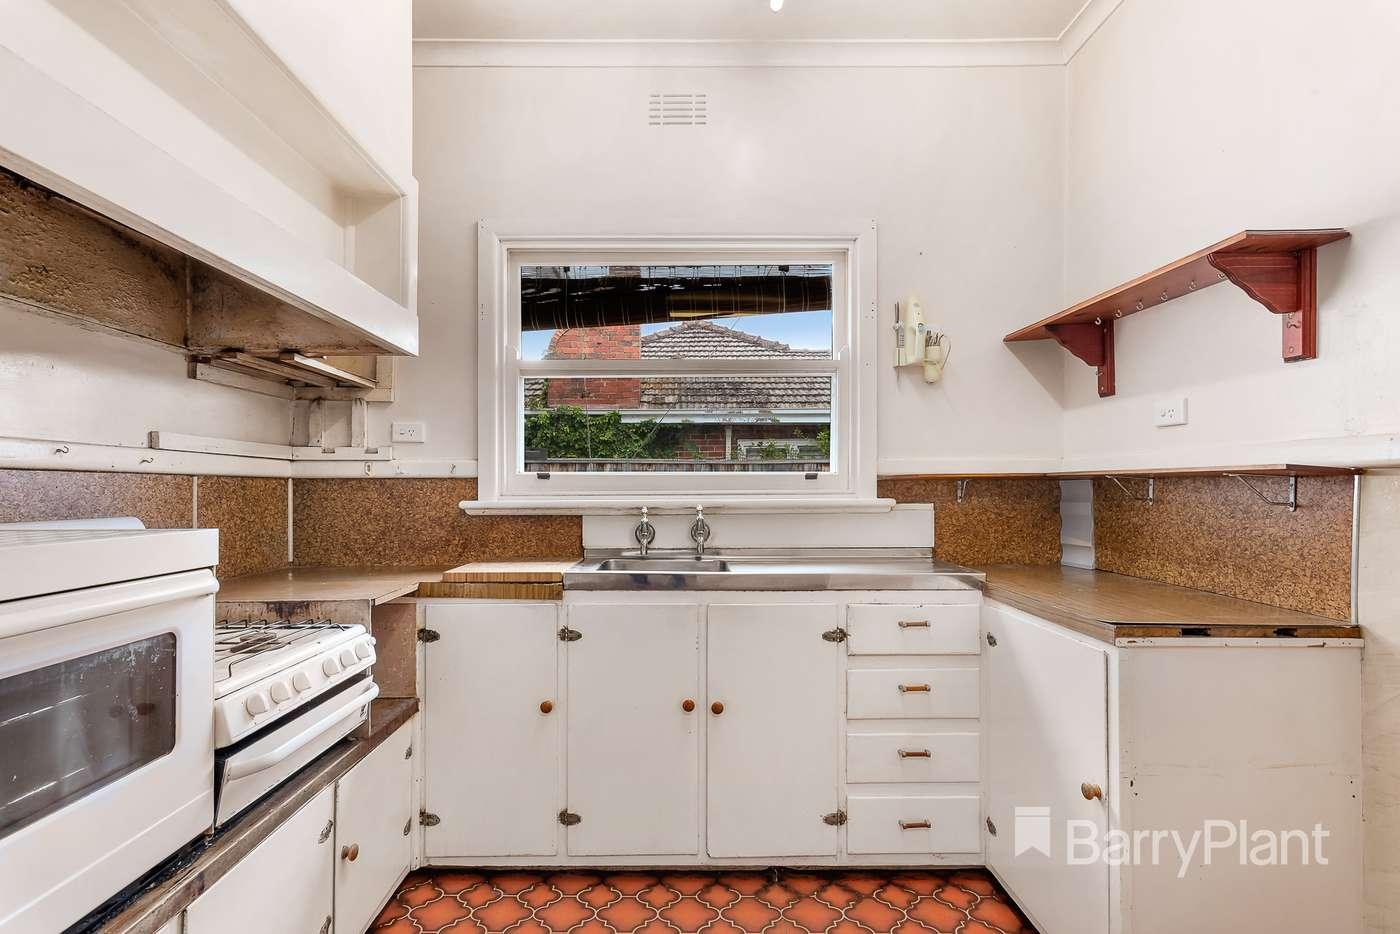 Sixth view of Homely house listing, 6 Gordon Street, Beaumaris VIC 3193